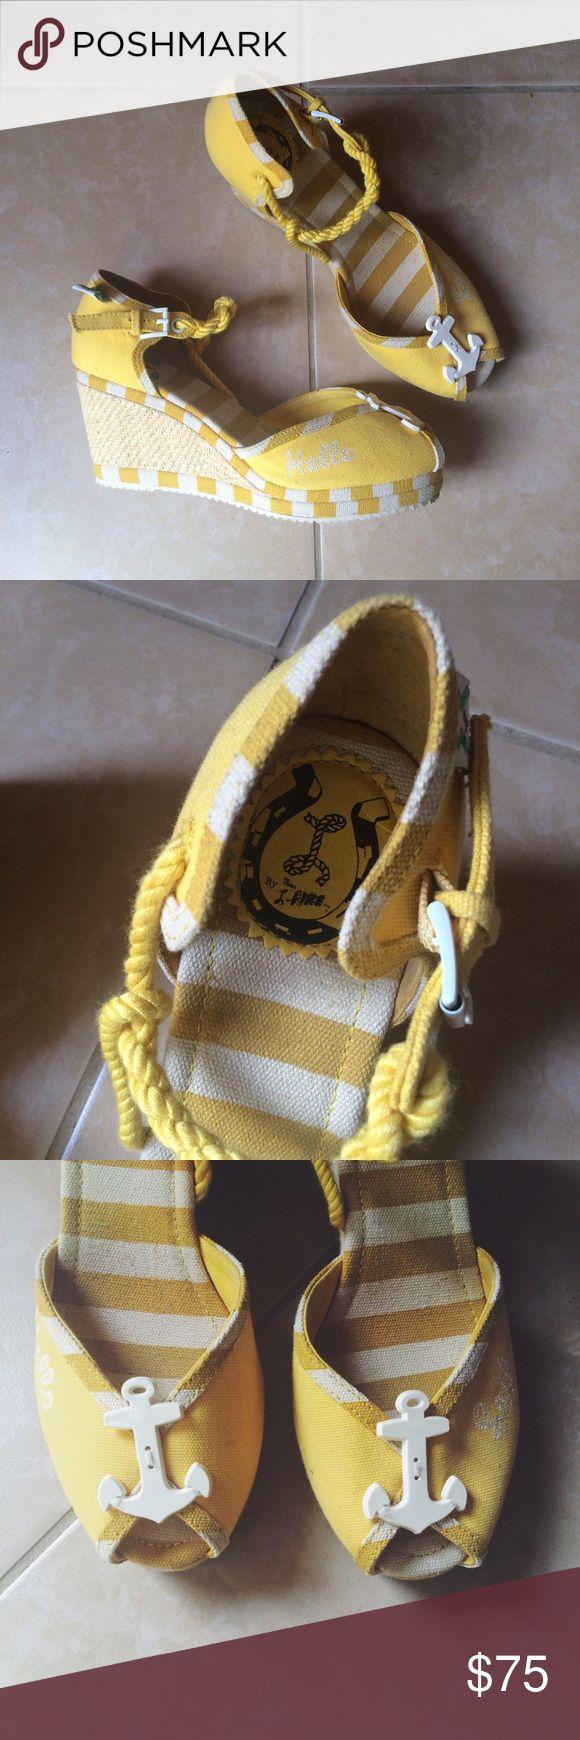 "Miss L Fire ""Hello Sailor"" yellow espadrilles 41 Brand // Miss L Fire  Size // 41 / US 10 Excellent condition. Retro / vintage 1940s style. miss l fire Shoes Wedges"